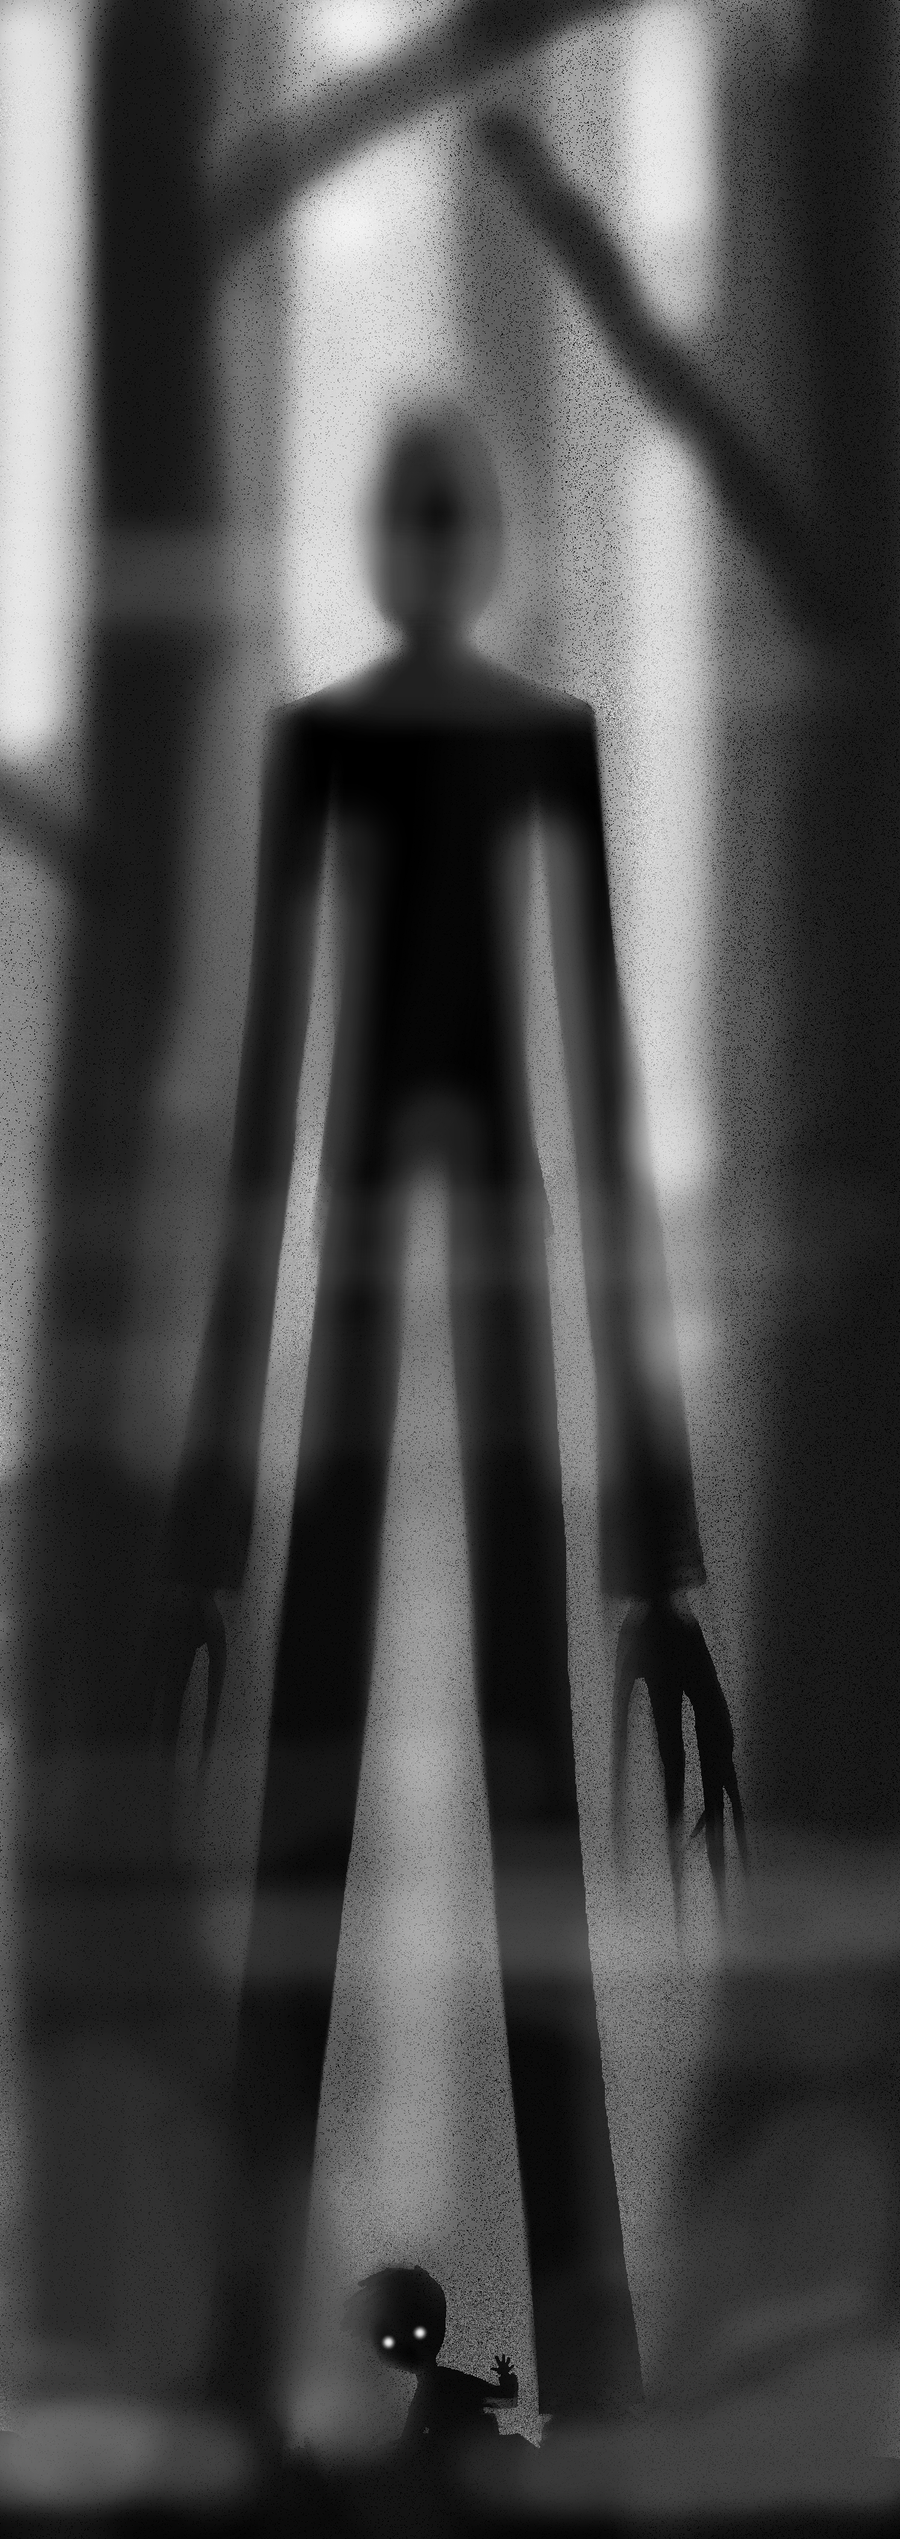 limbo__the_slenderman_by_tehcheychibi-d4g9rrz